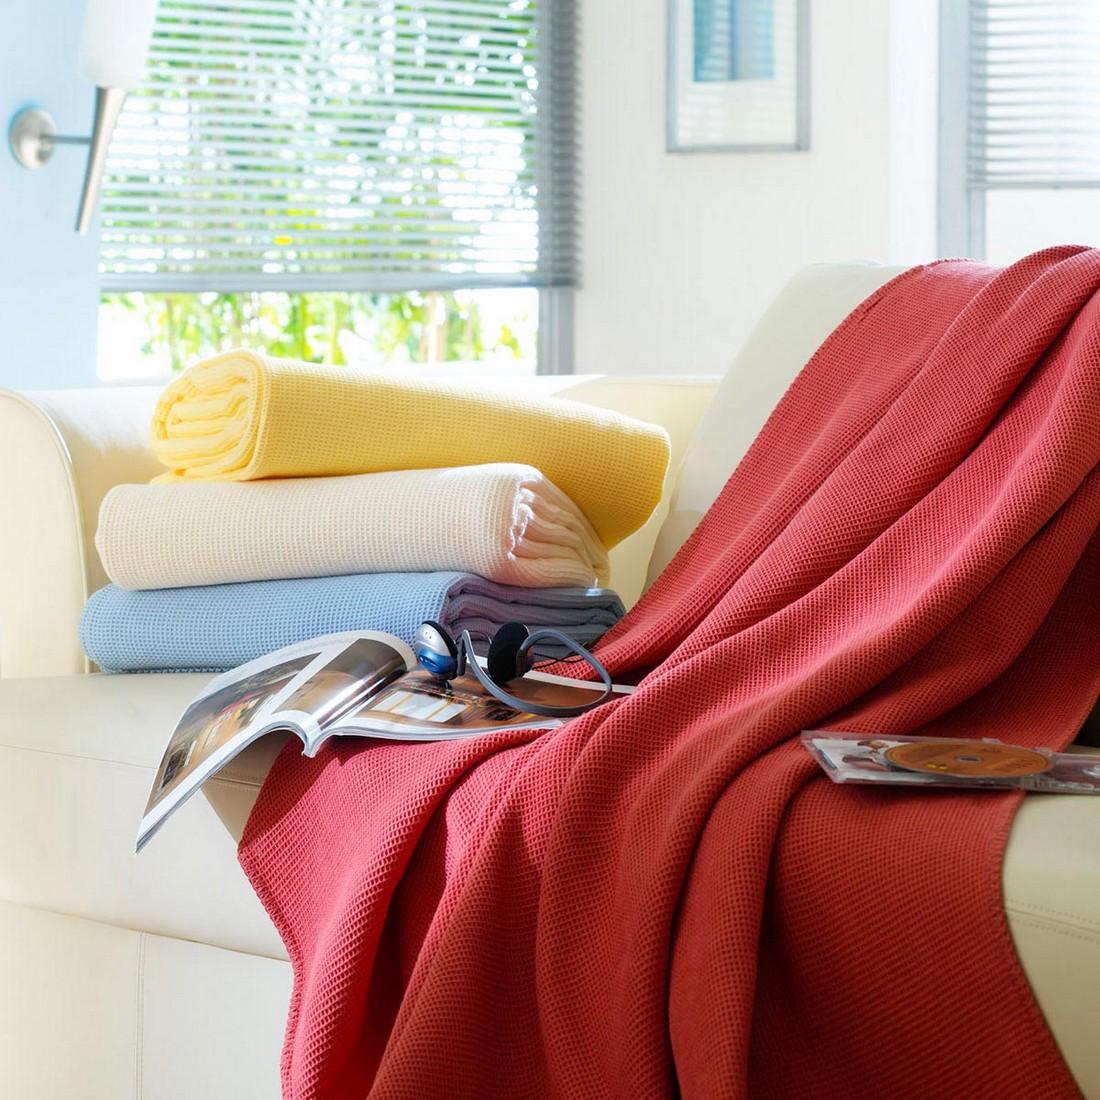 Piqué Baumwolldecke – 100% Baumwolle sonne – Ausführung 150×210 cm, Bettwaren-Shop jetzt bestellen